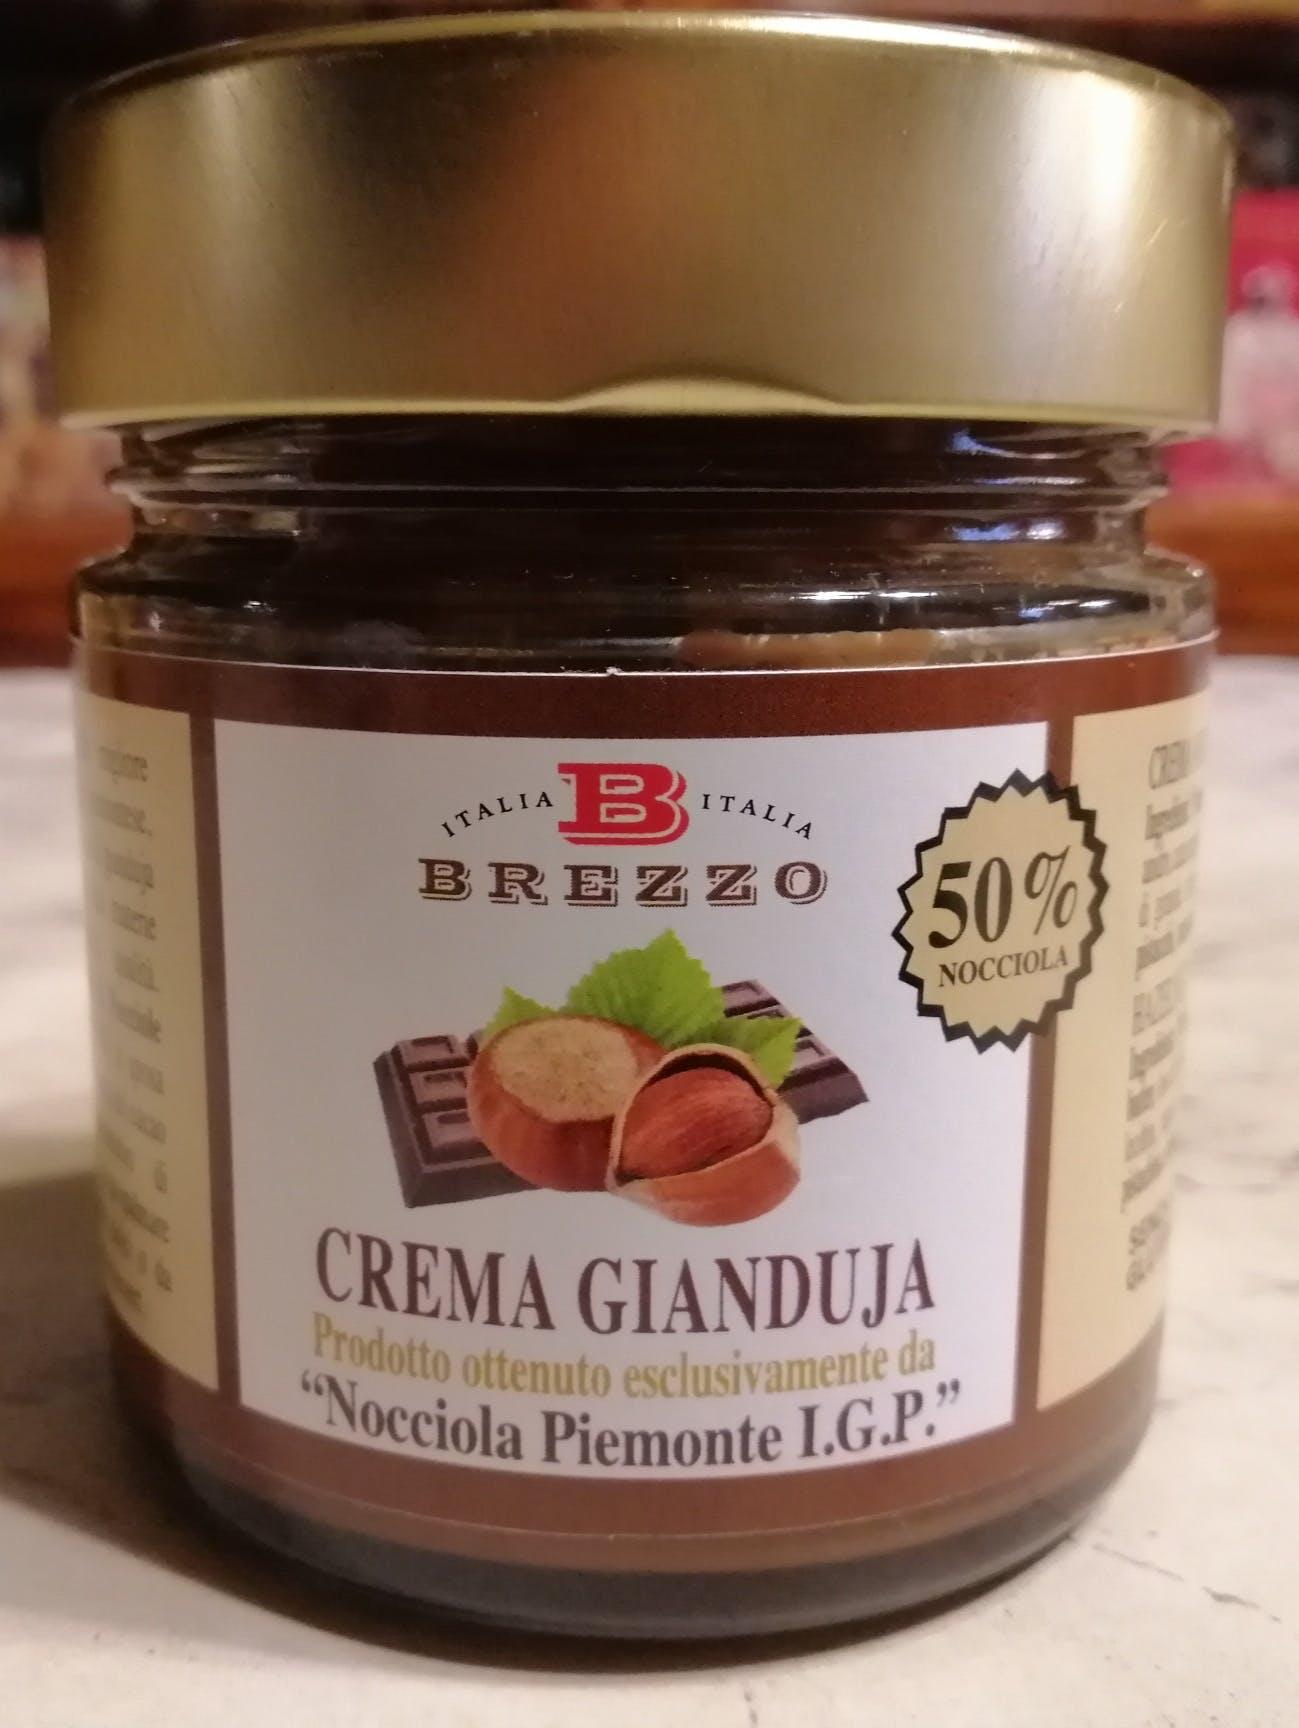 Brezzo, Crema Gianduia 50%